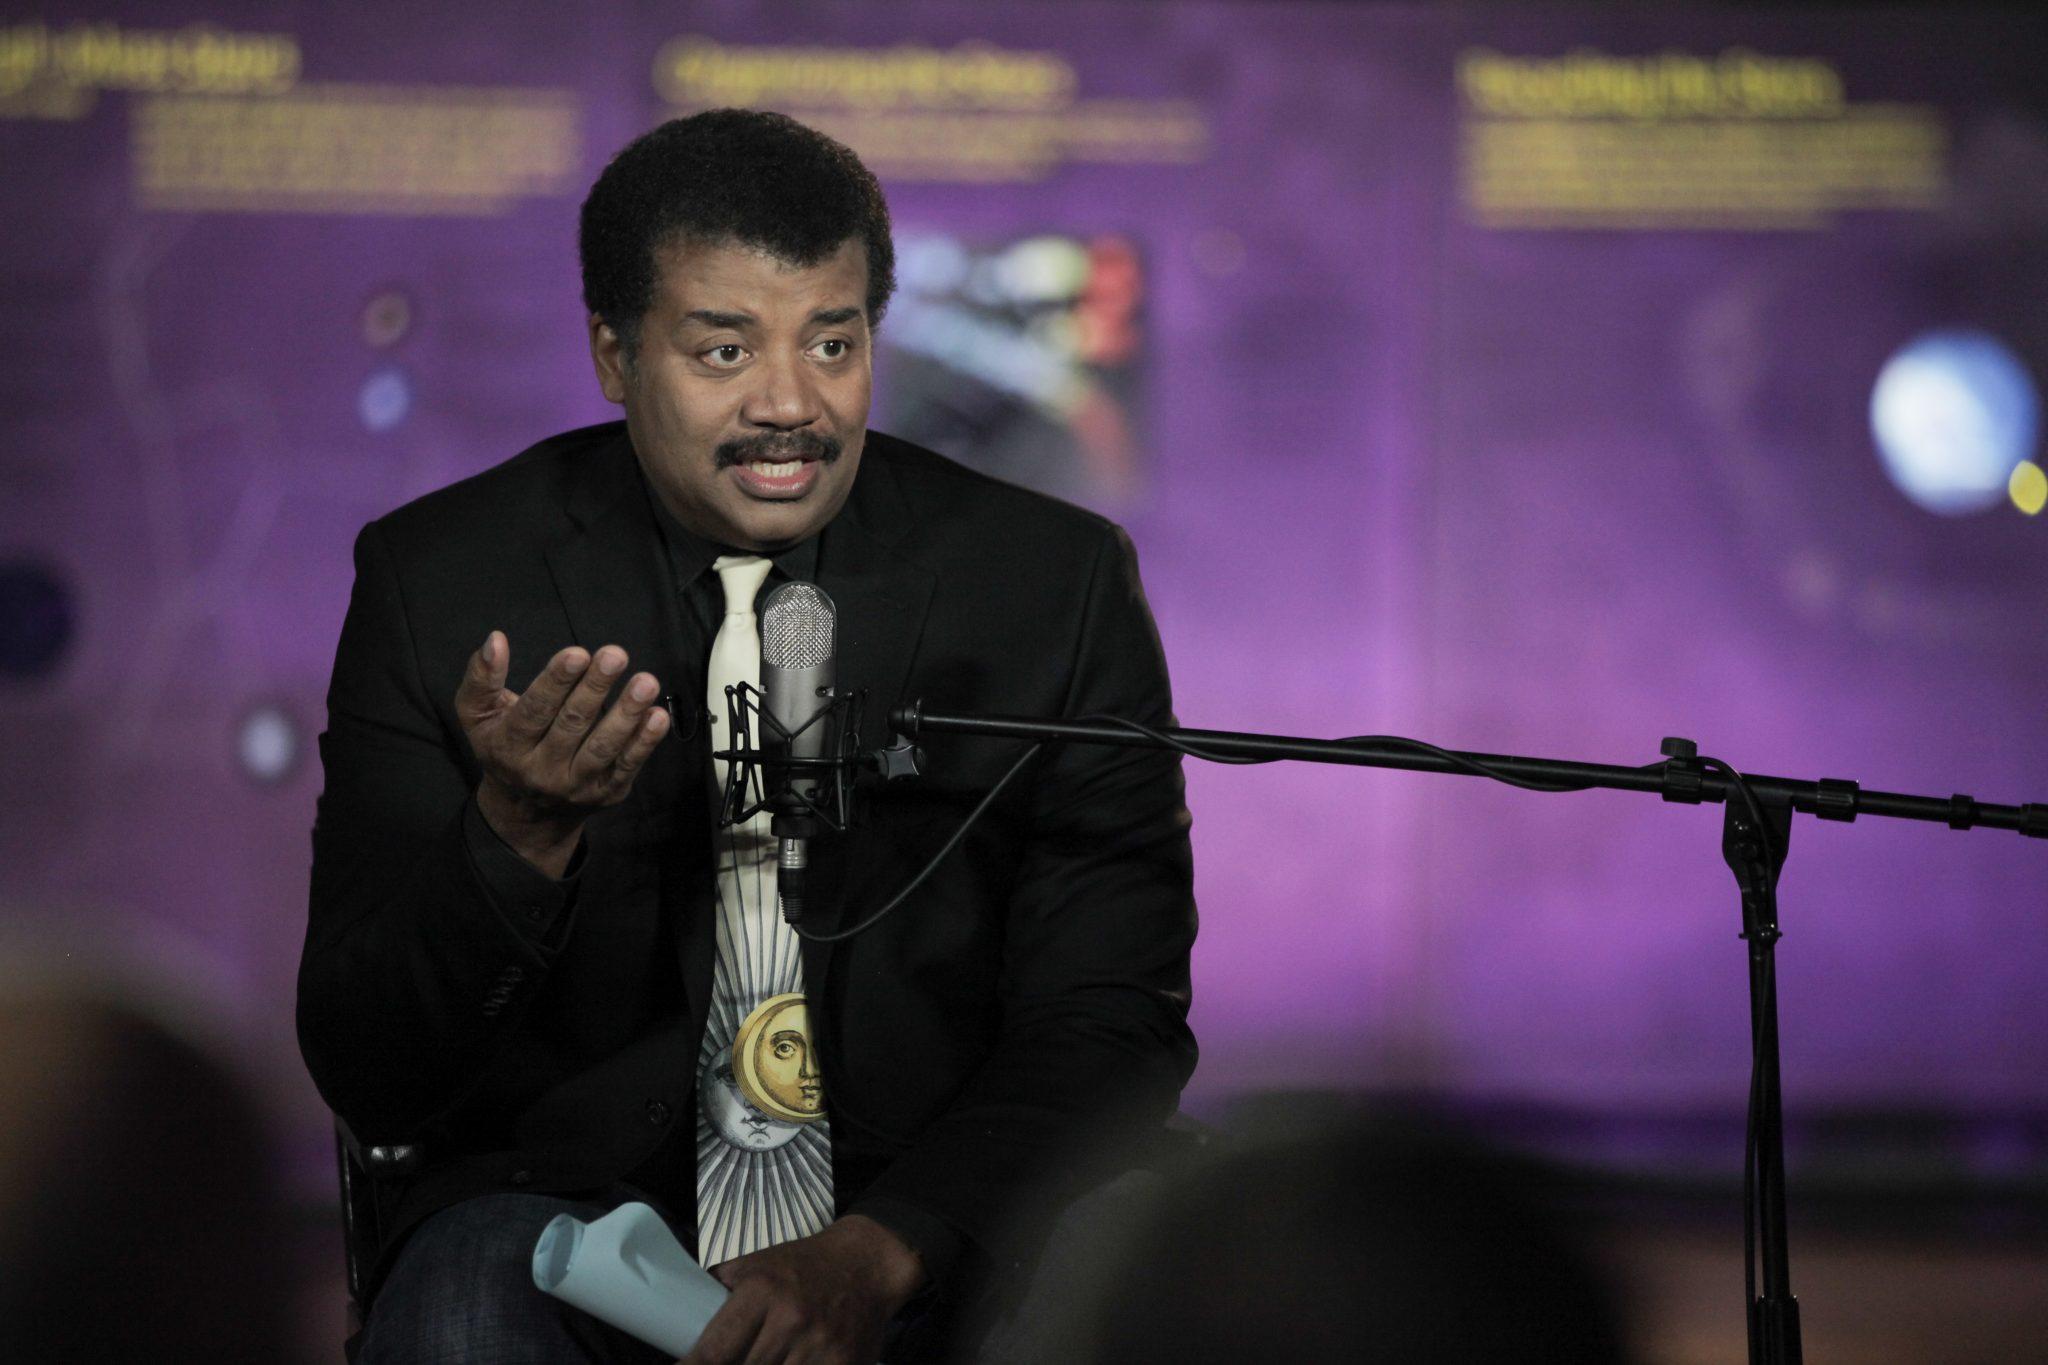 Interview: Astrophysicist Neil deGrasse Tyson on Politics and AI